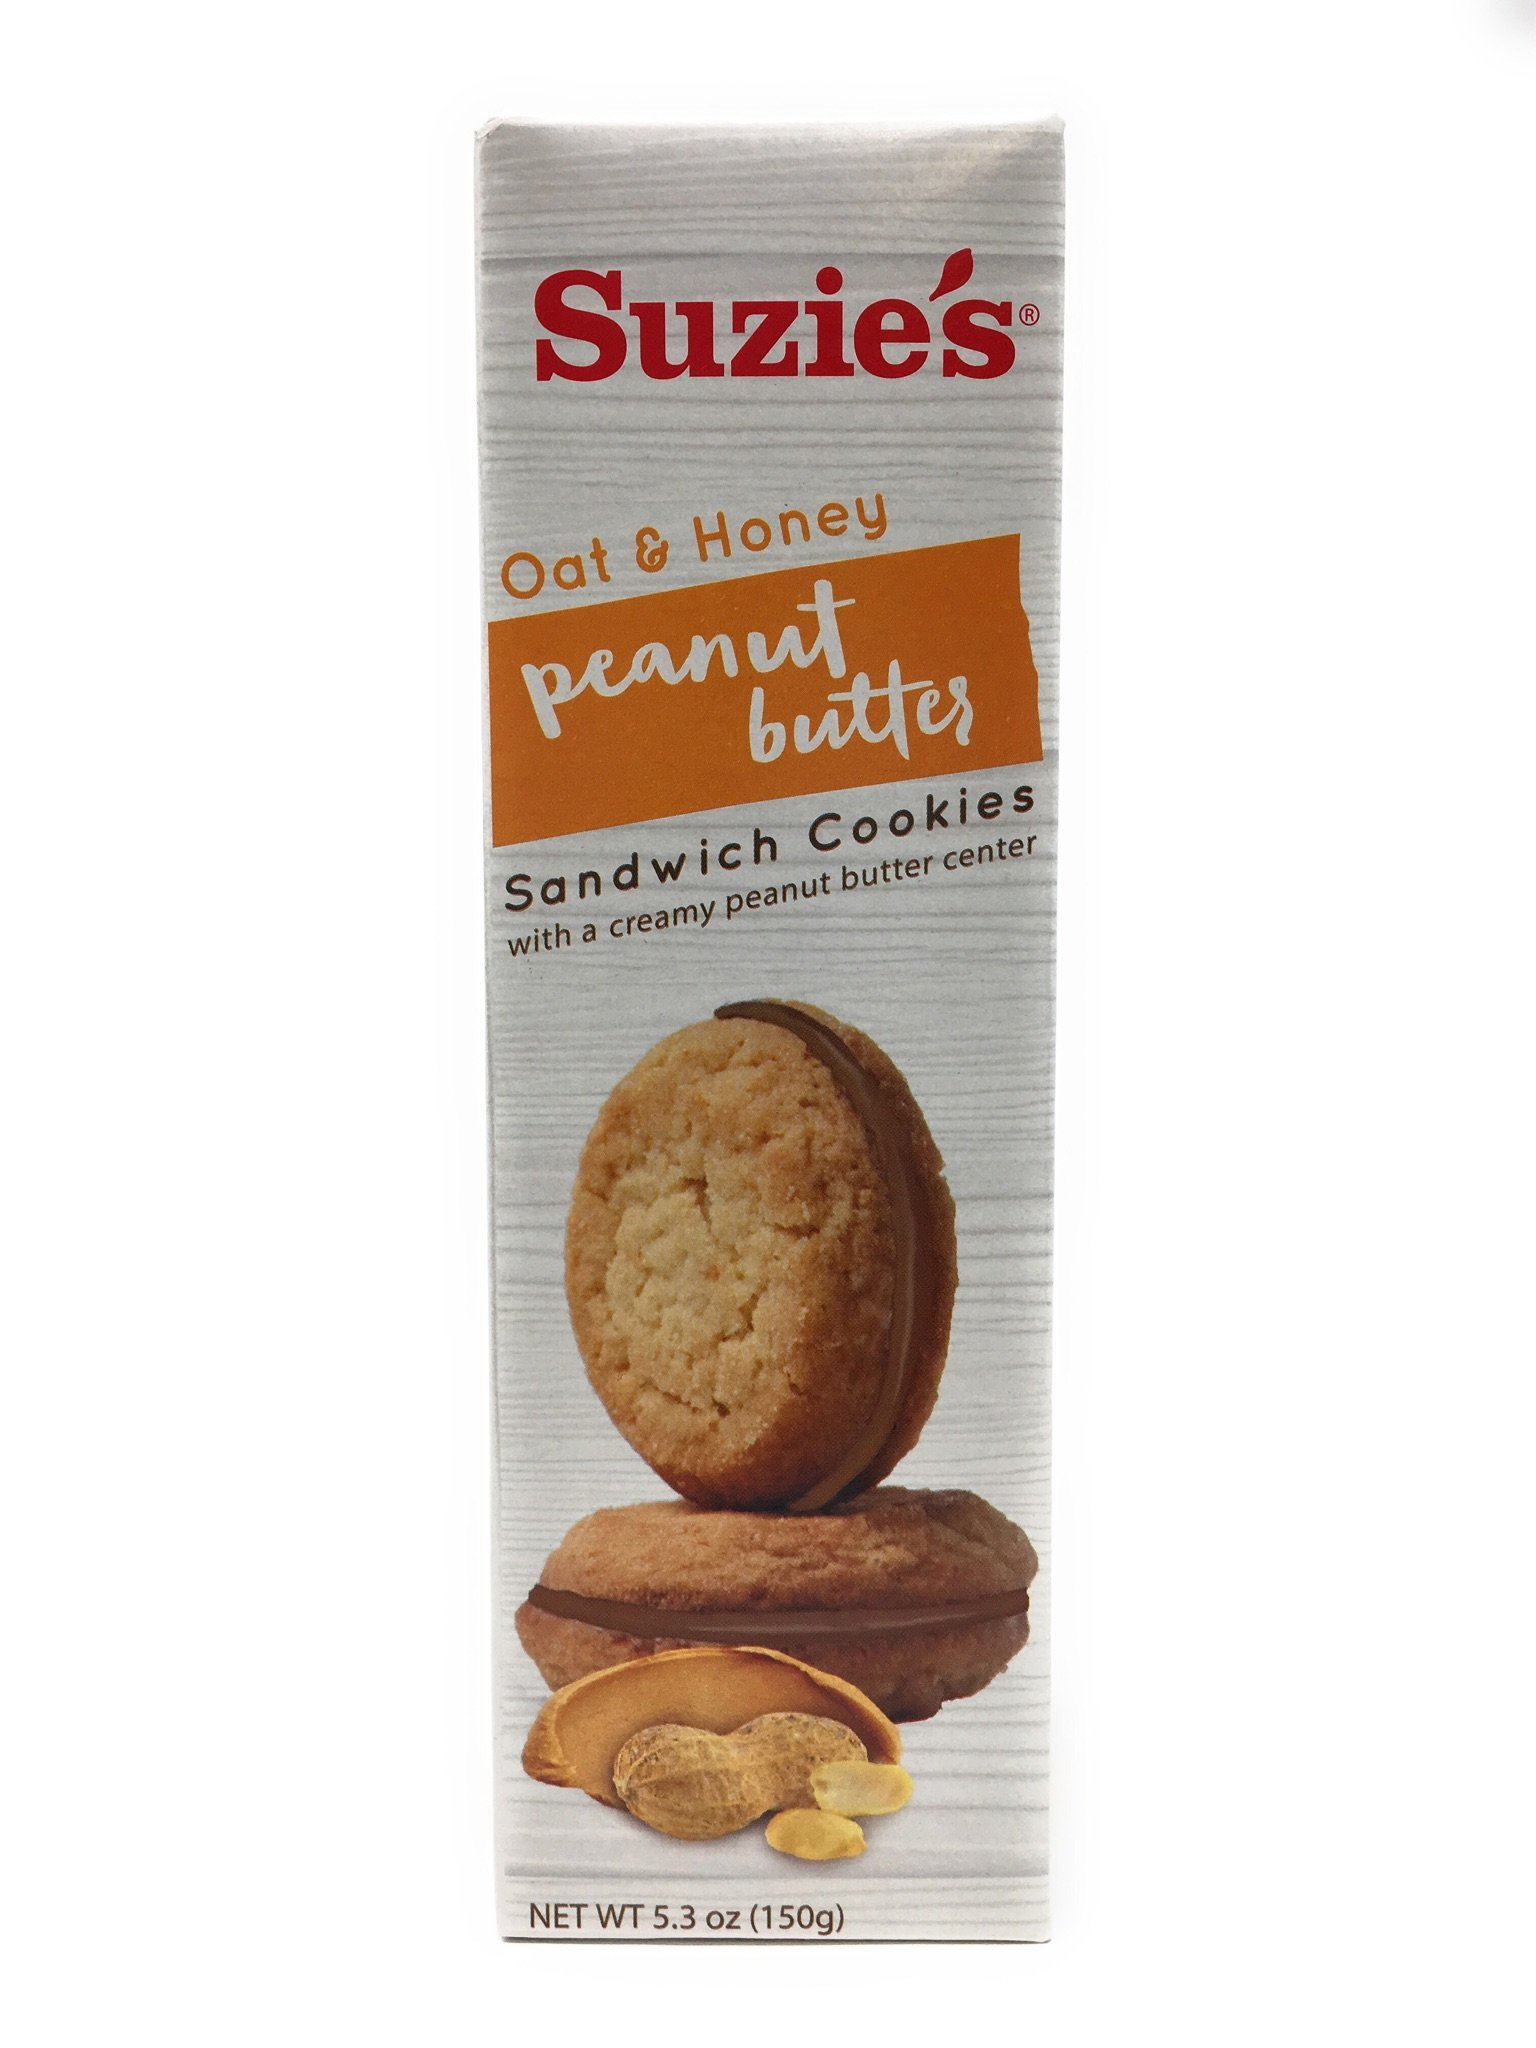 Suzie's Oat & Honey Peanut Butter Sandwich Cookie, 5.3 oz. (Pack of 6)